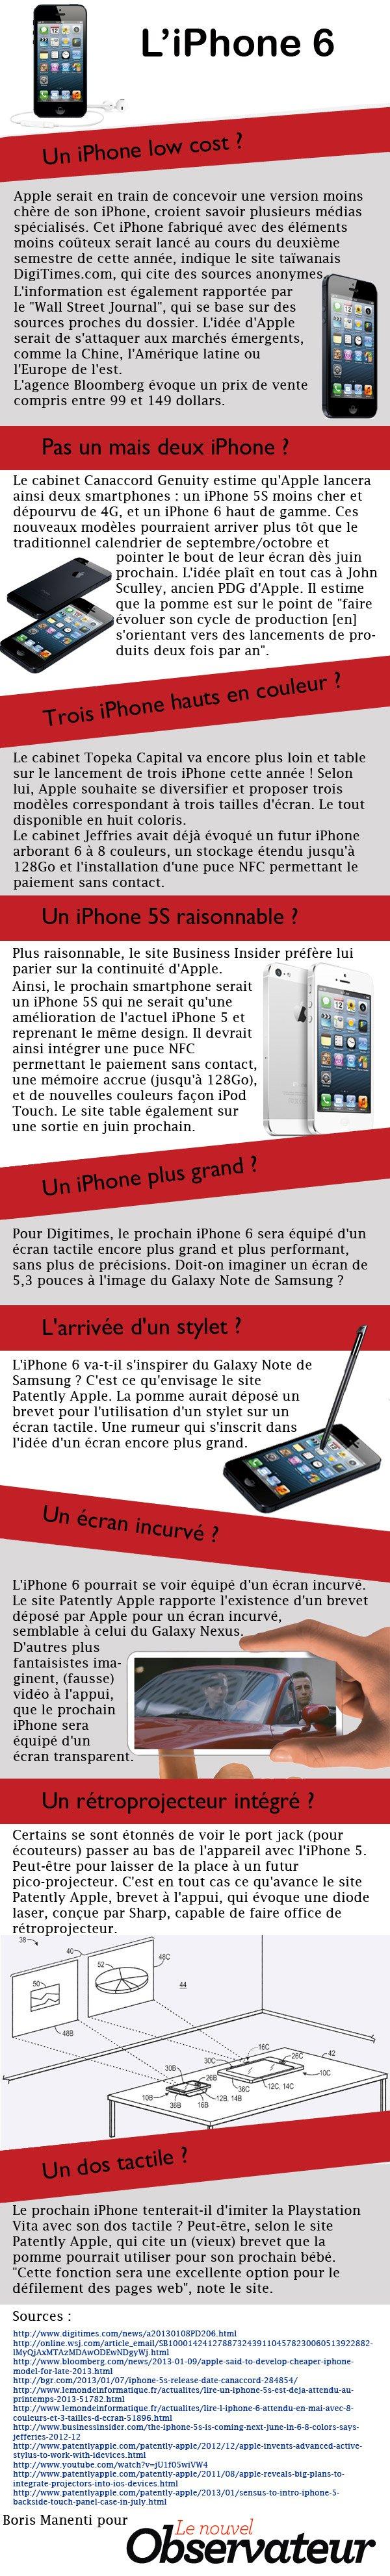 iphone 6 iphone 5s - iPhone 6 et iPhone 5S : point sur les rumeurs